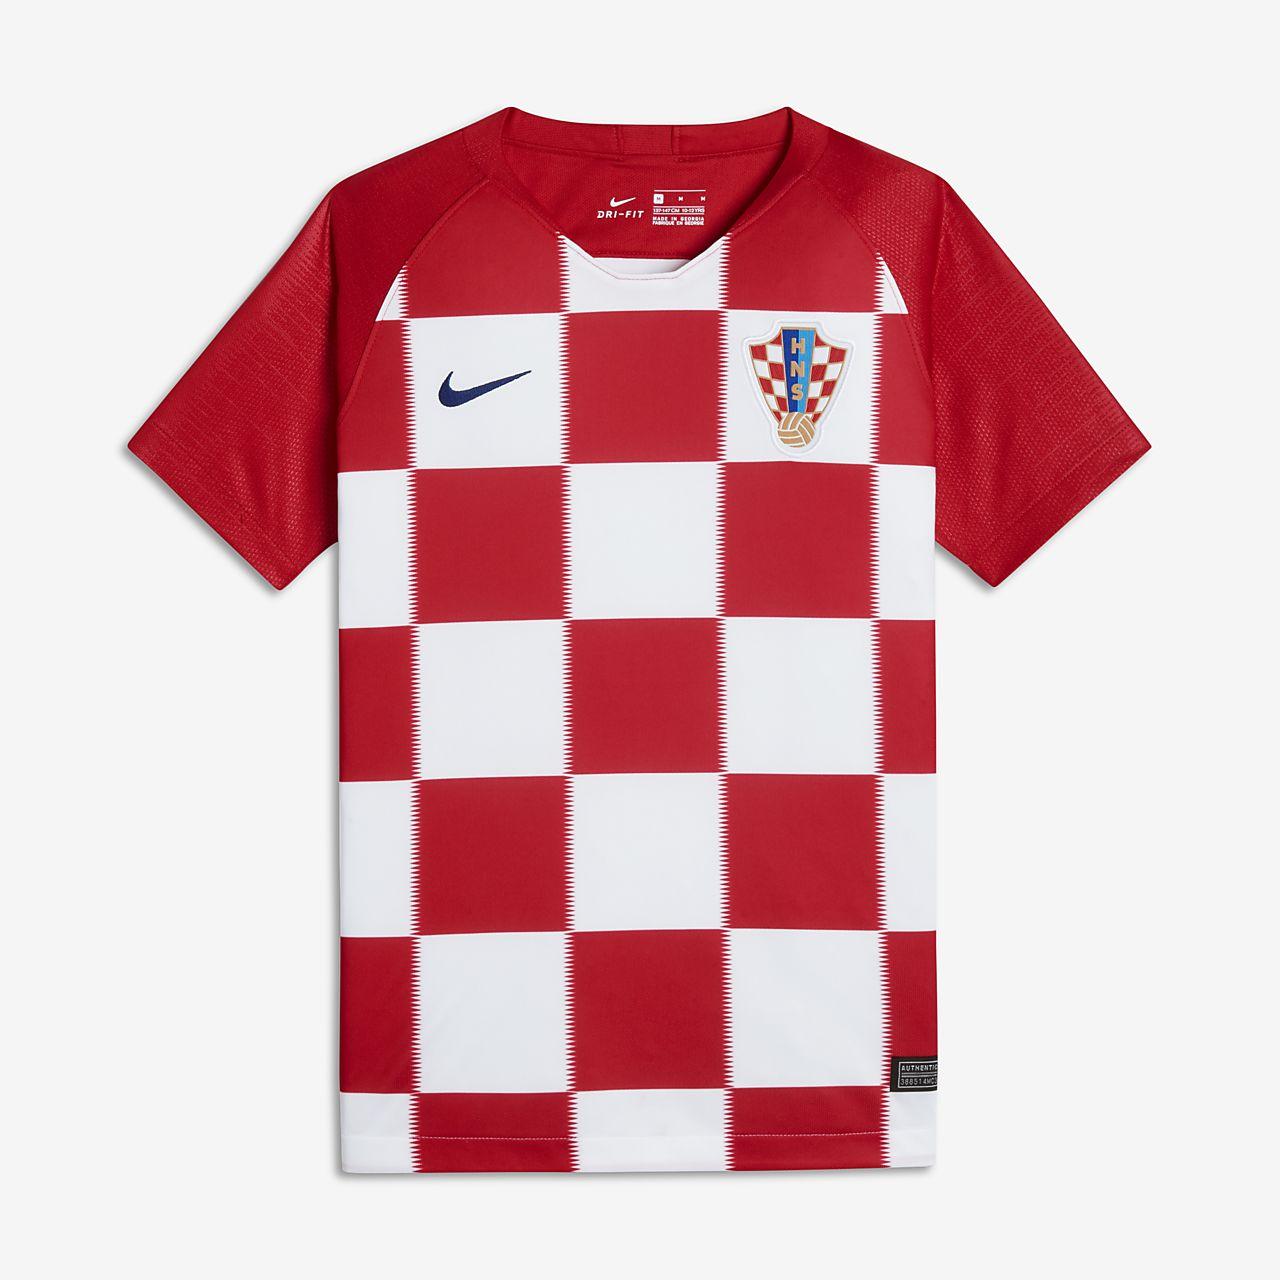 so cheap sale uk coupon code 2018 Kroatien Stadium Home Fußballtrikot für ältere Kinder